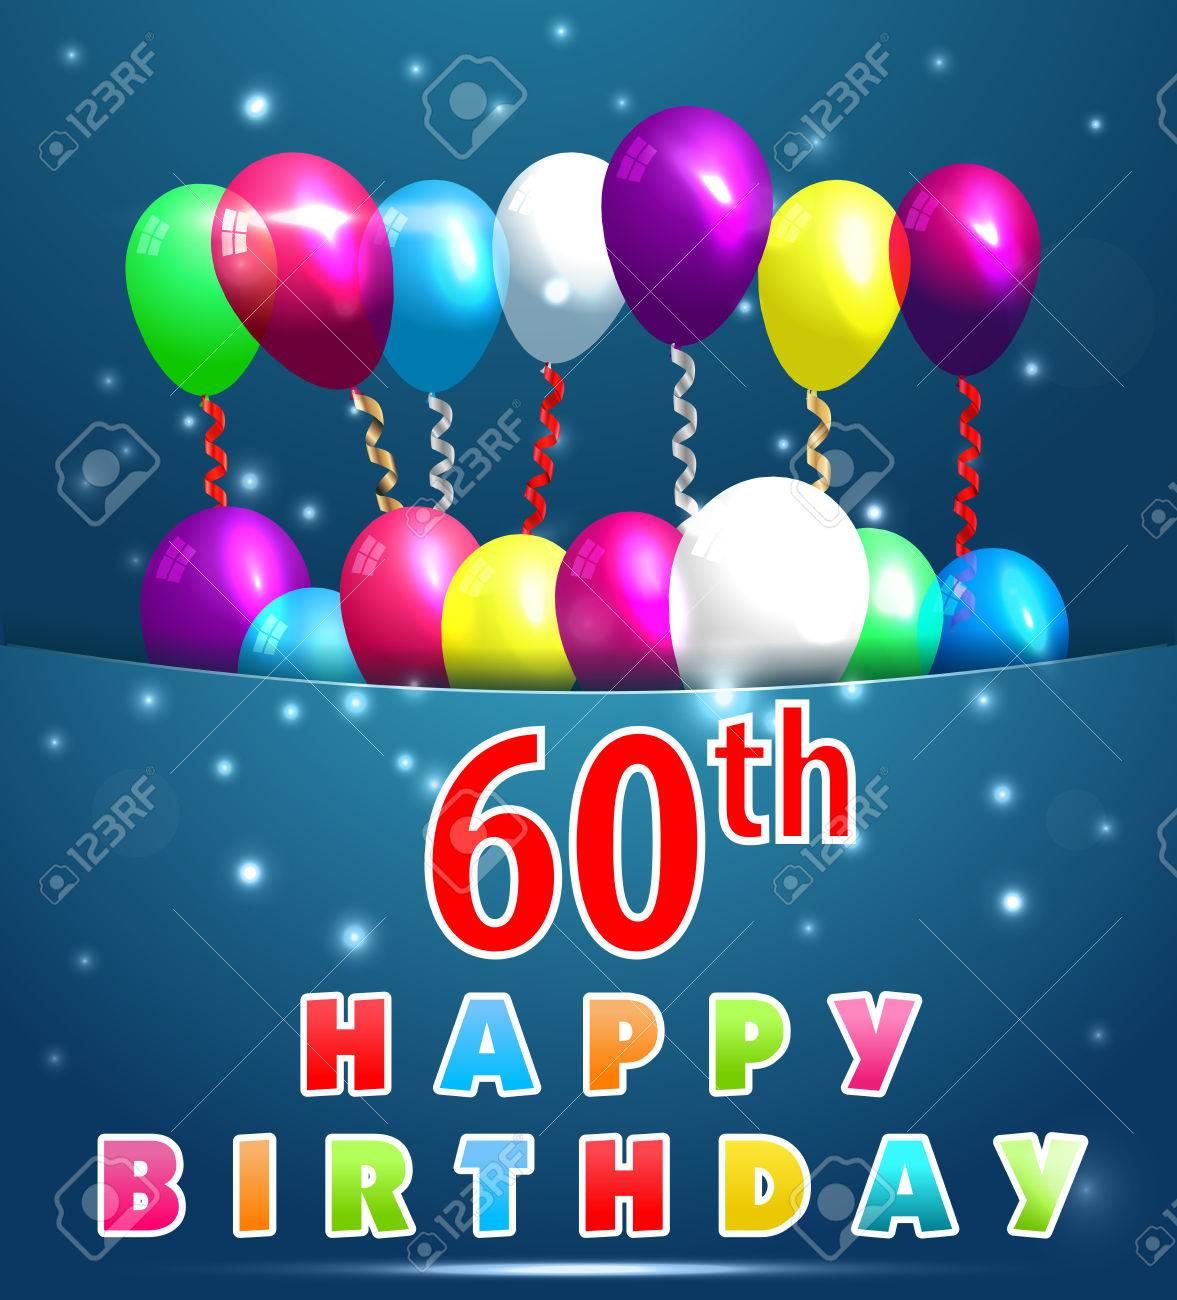 Karte 60 Geburtstag.Stock Photo